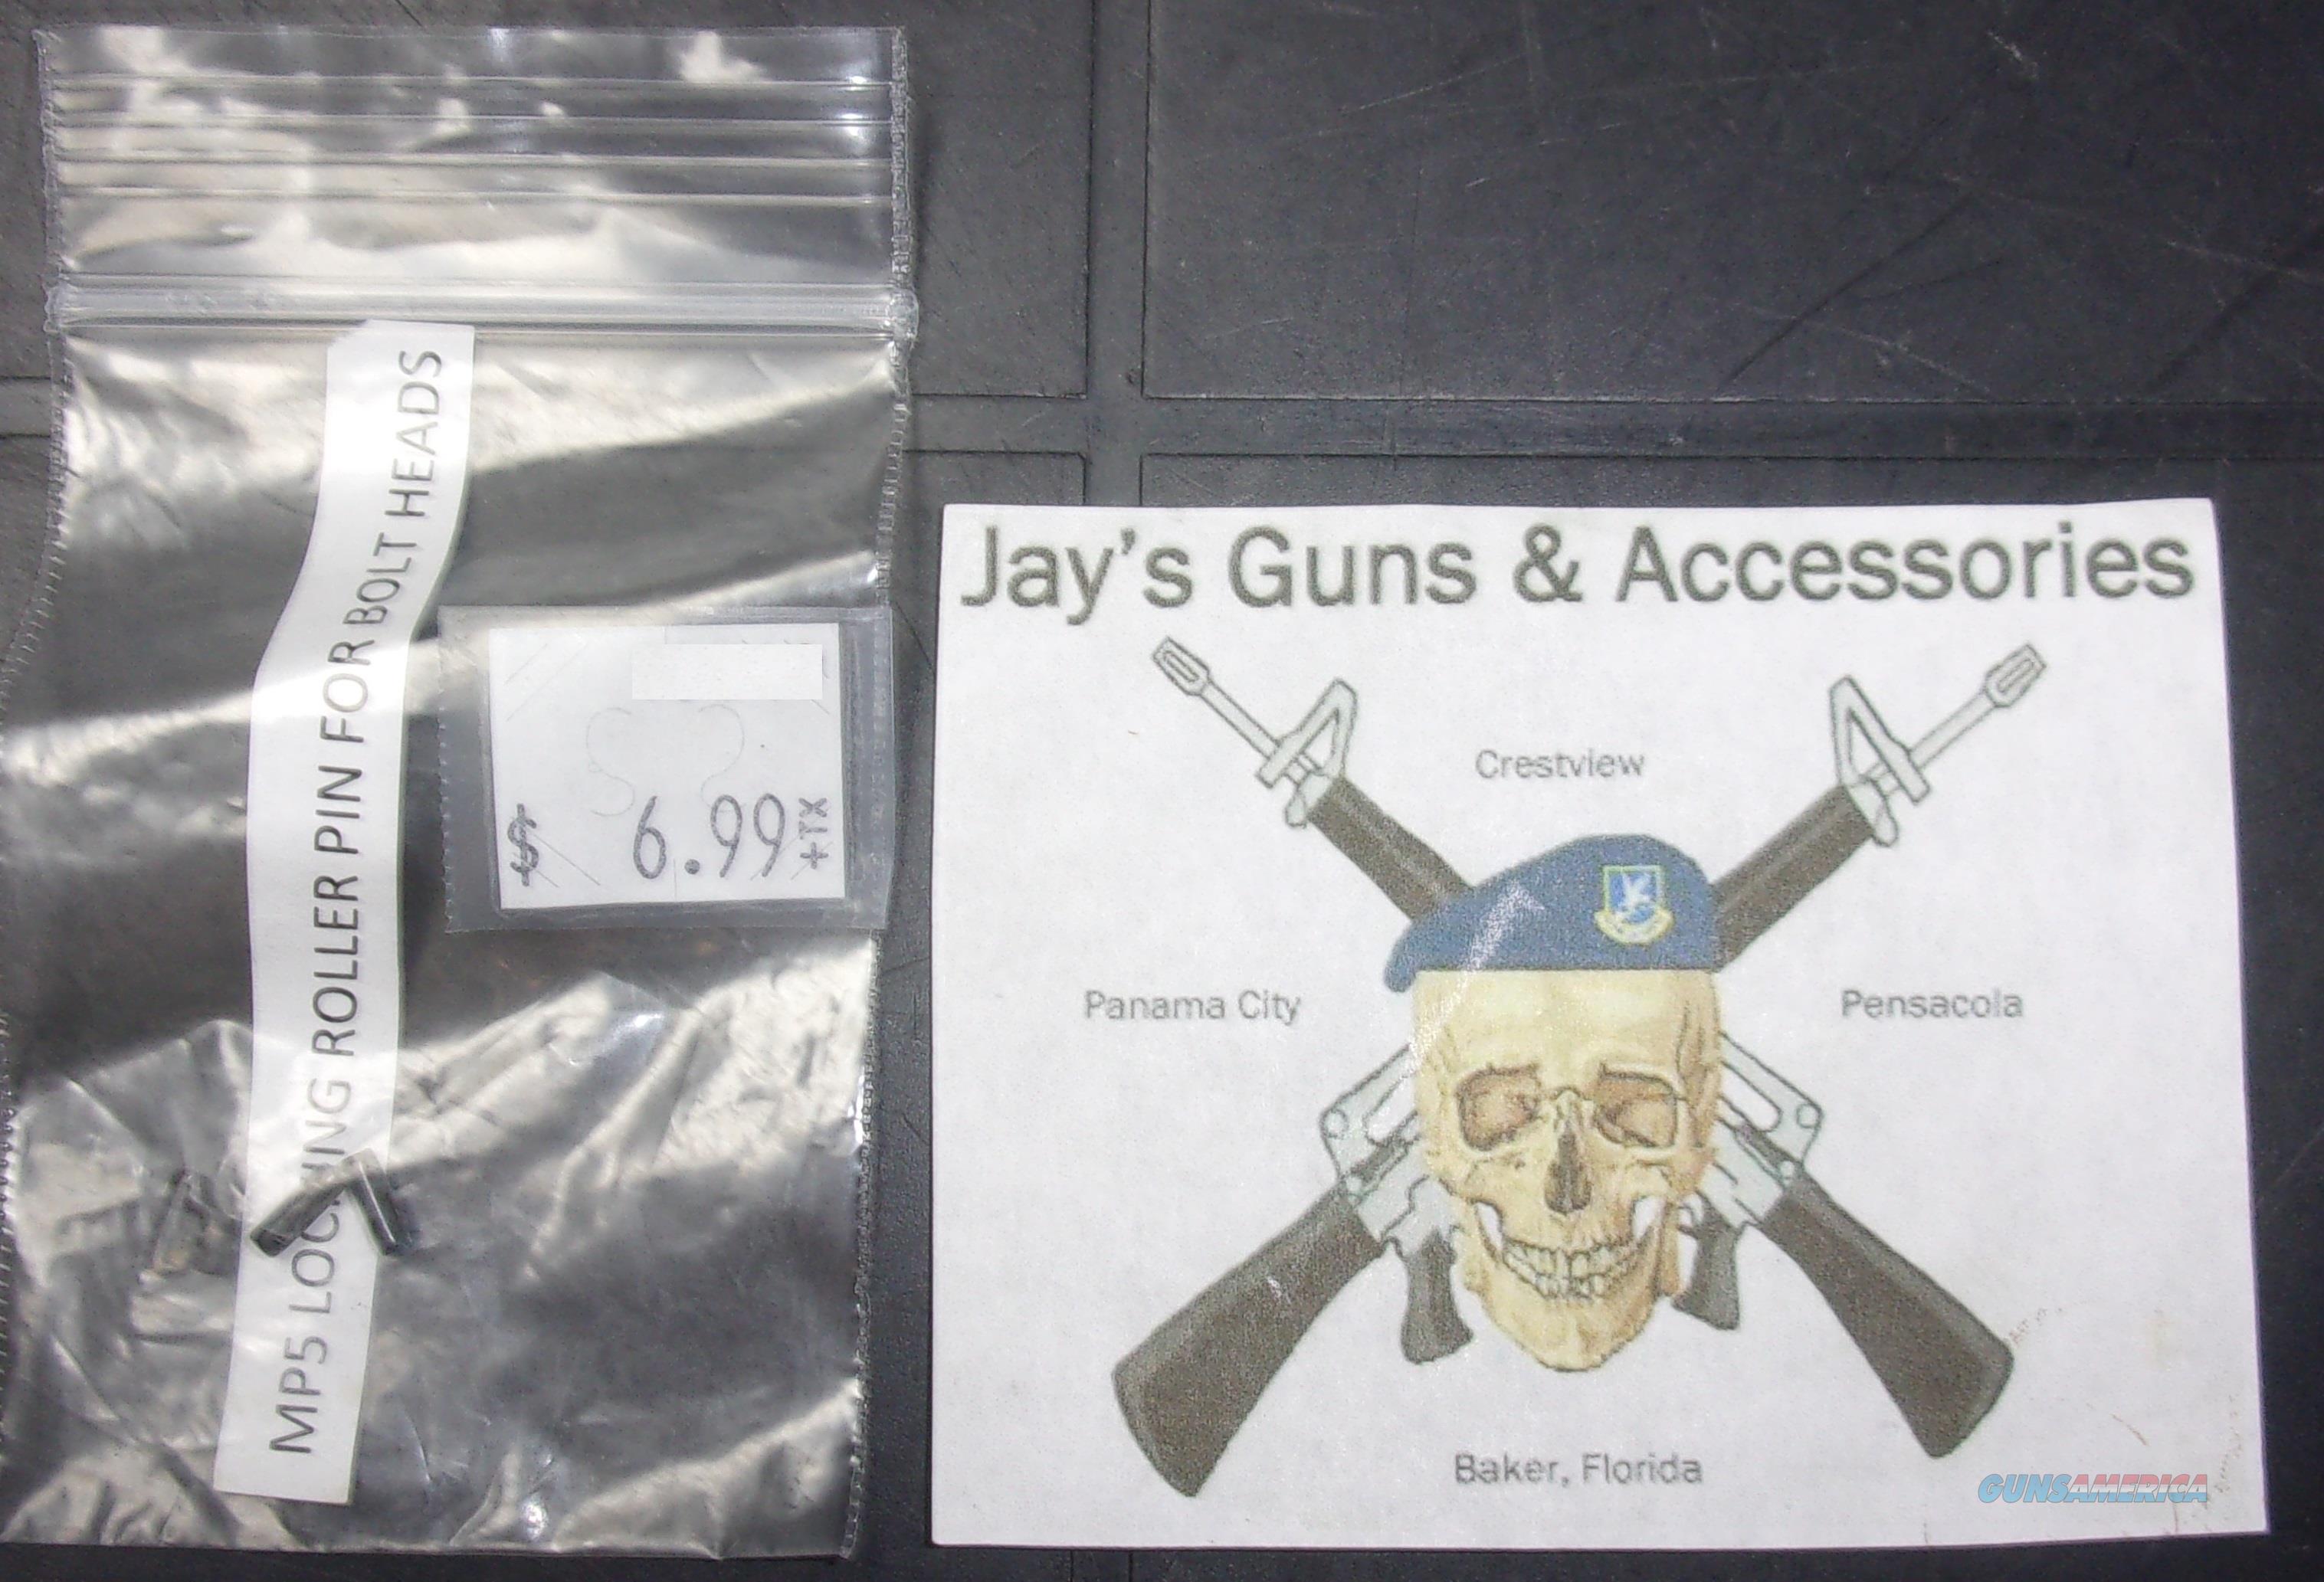 HK MP5 Locking Rollier Pin for Bolt Heads  Non-Guns > Gun Parts > Rifle/Accuracy/Sniper